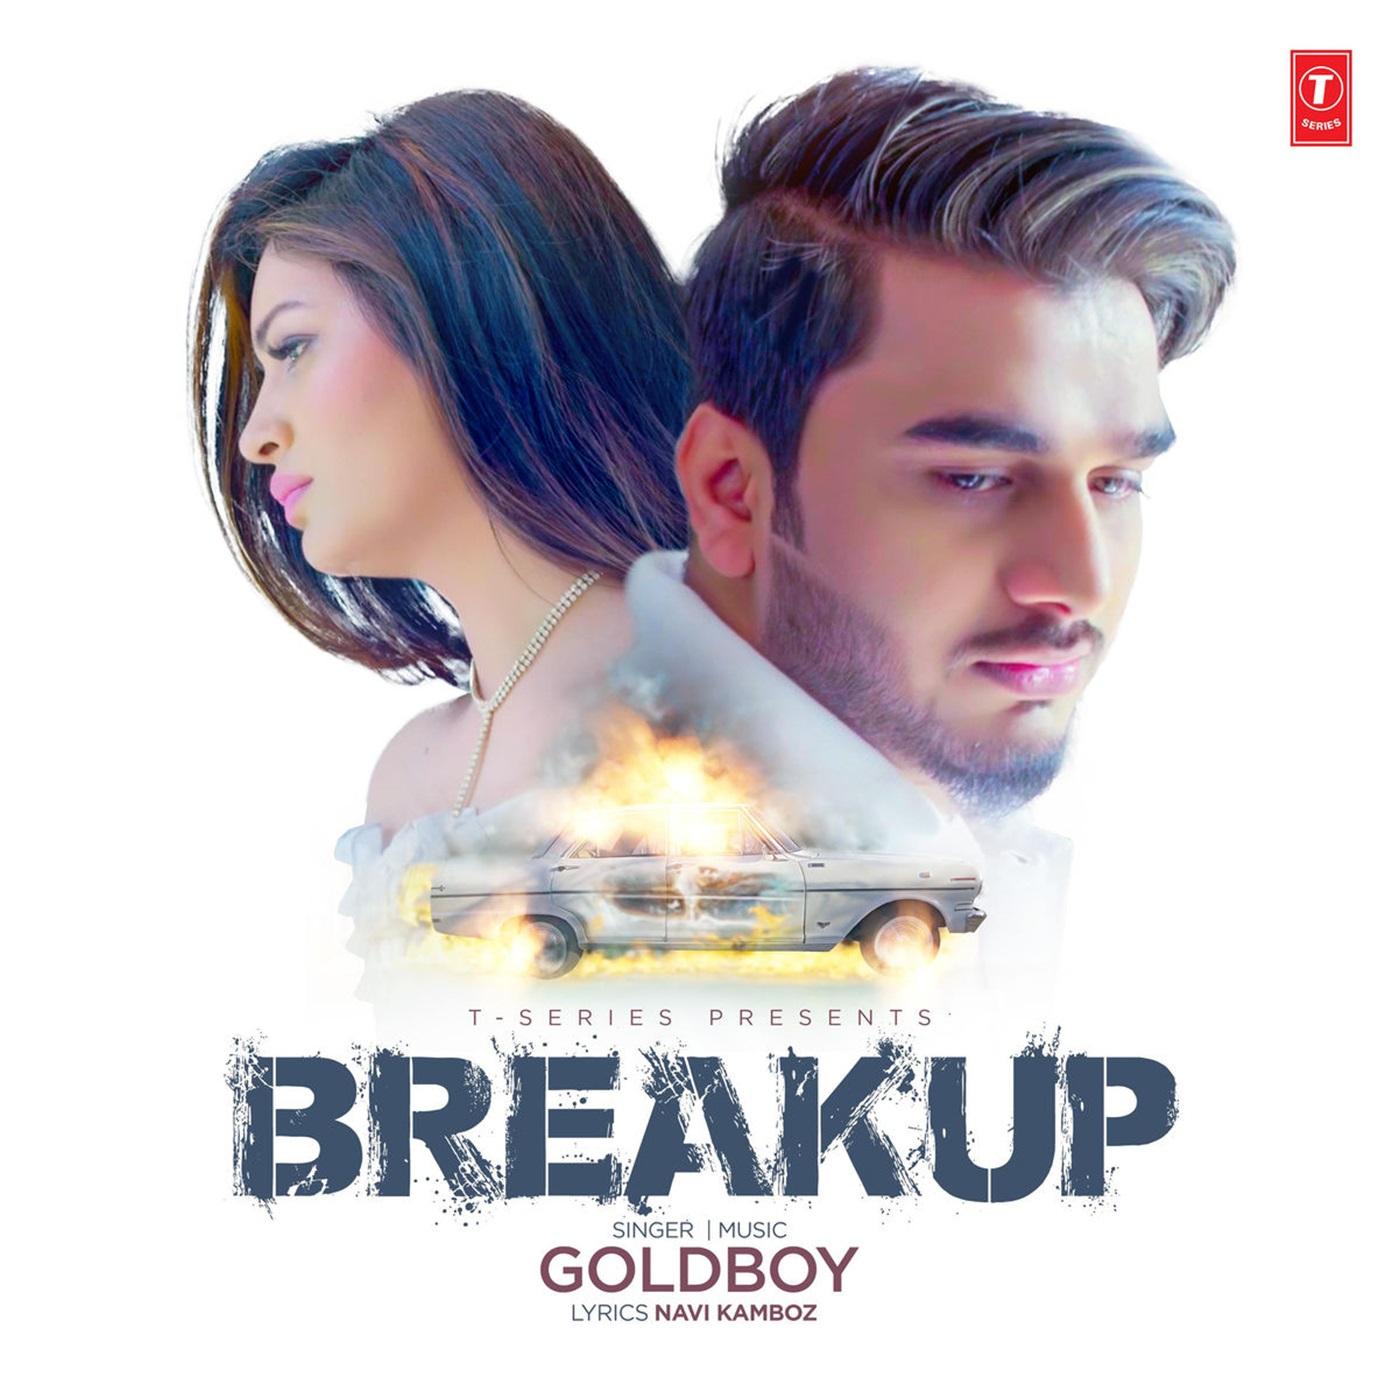 Goldboy - Breakup - Single [M4A - MP3] [iTunes-Rip]